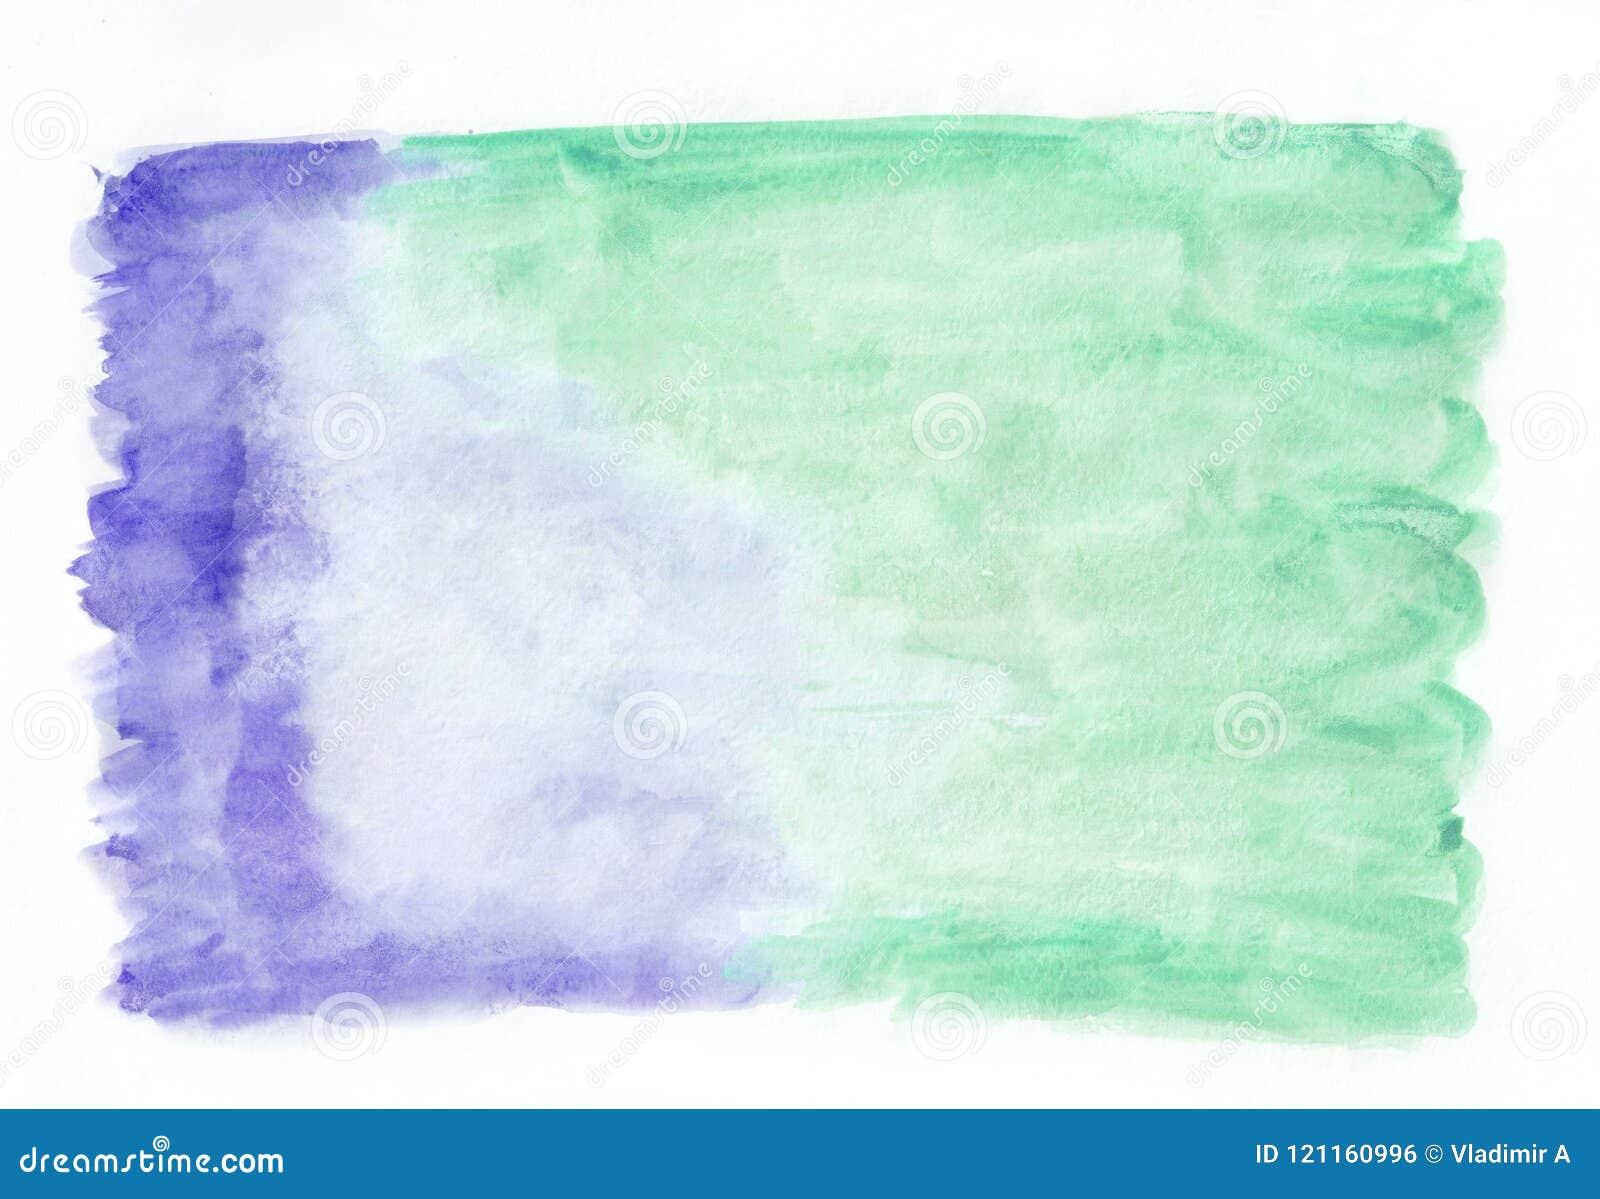 Indigo Iris And Mint Jade Mixed Watercolor Horizontal Gradient